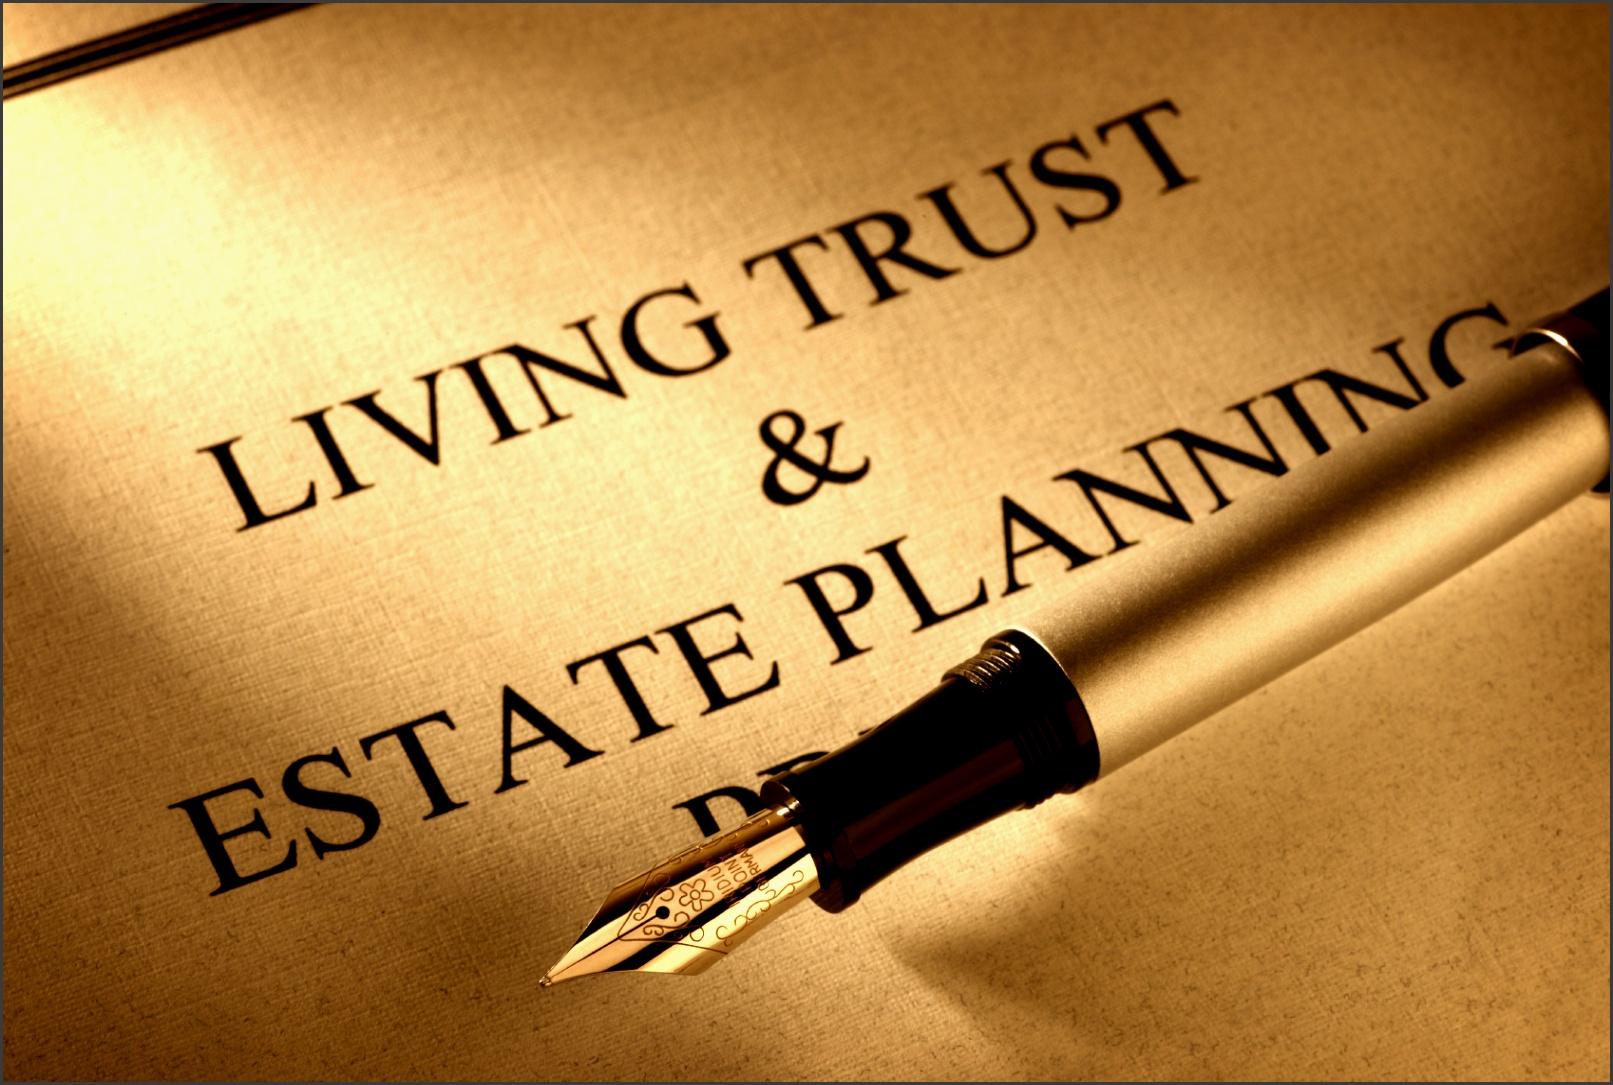 10 parts of a plete estate plan